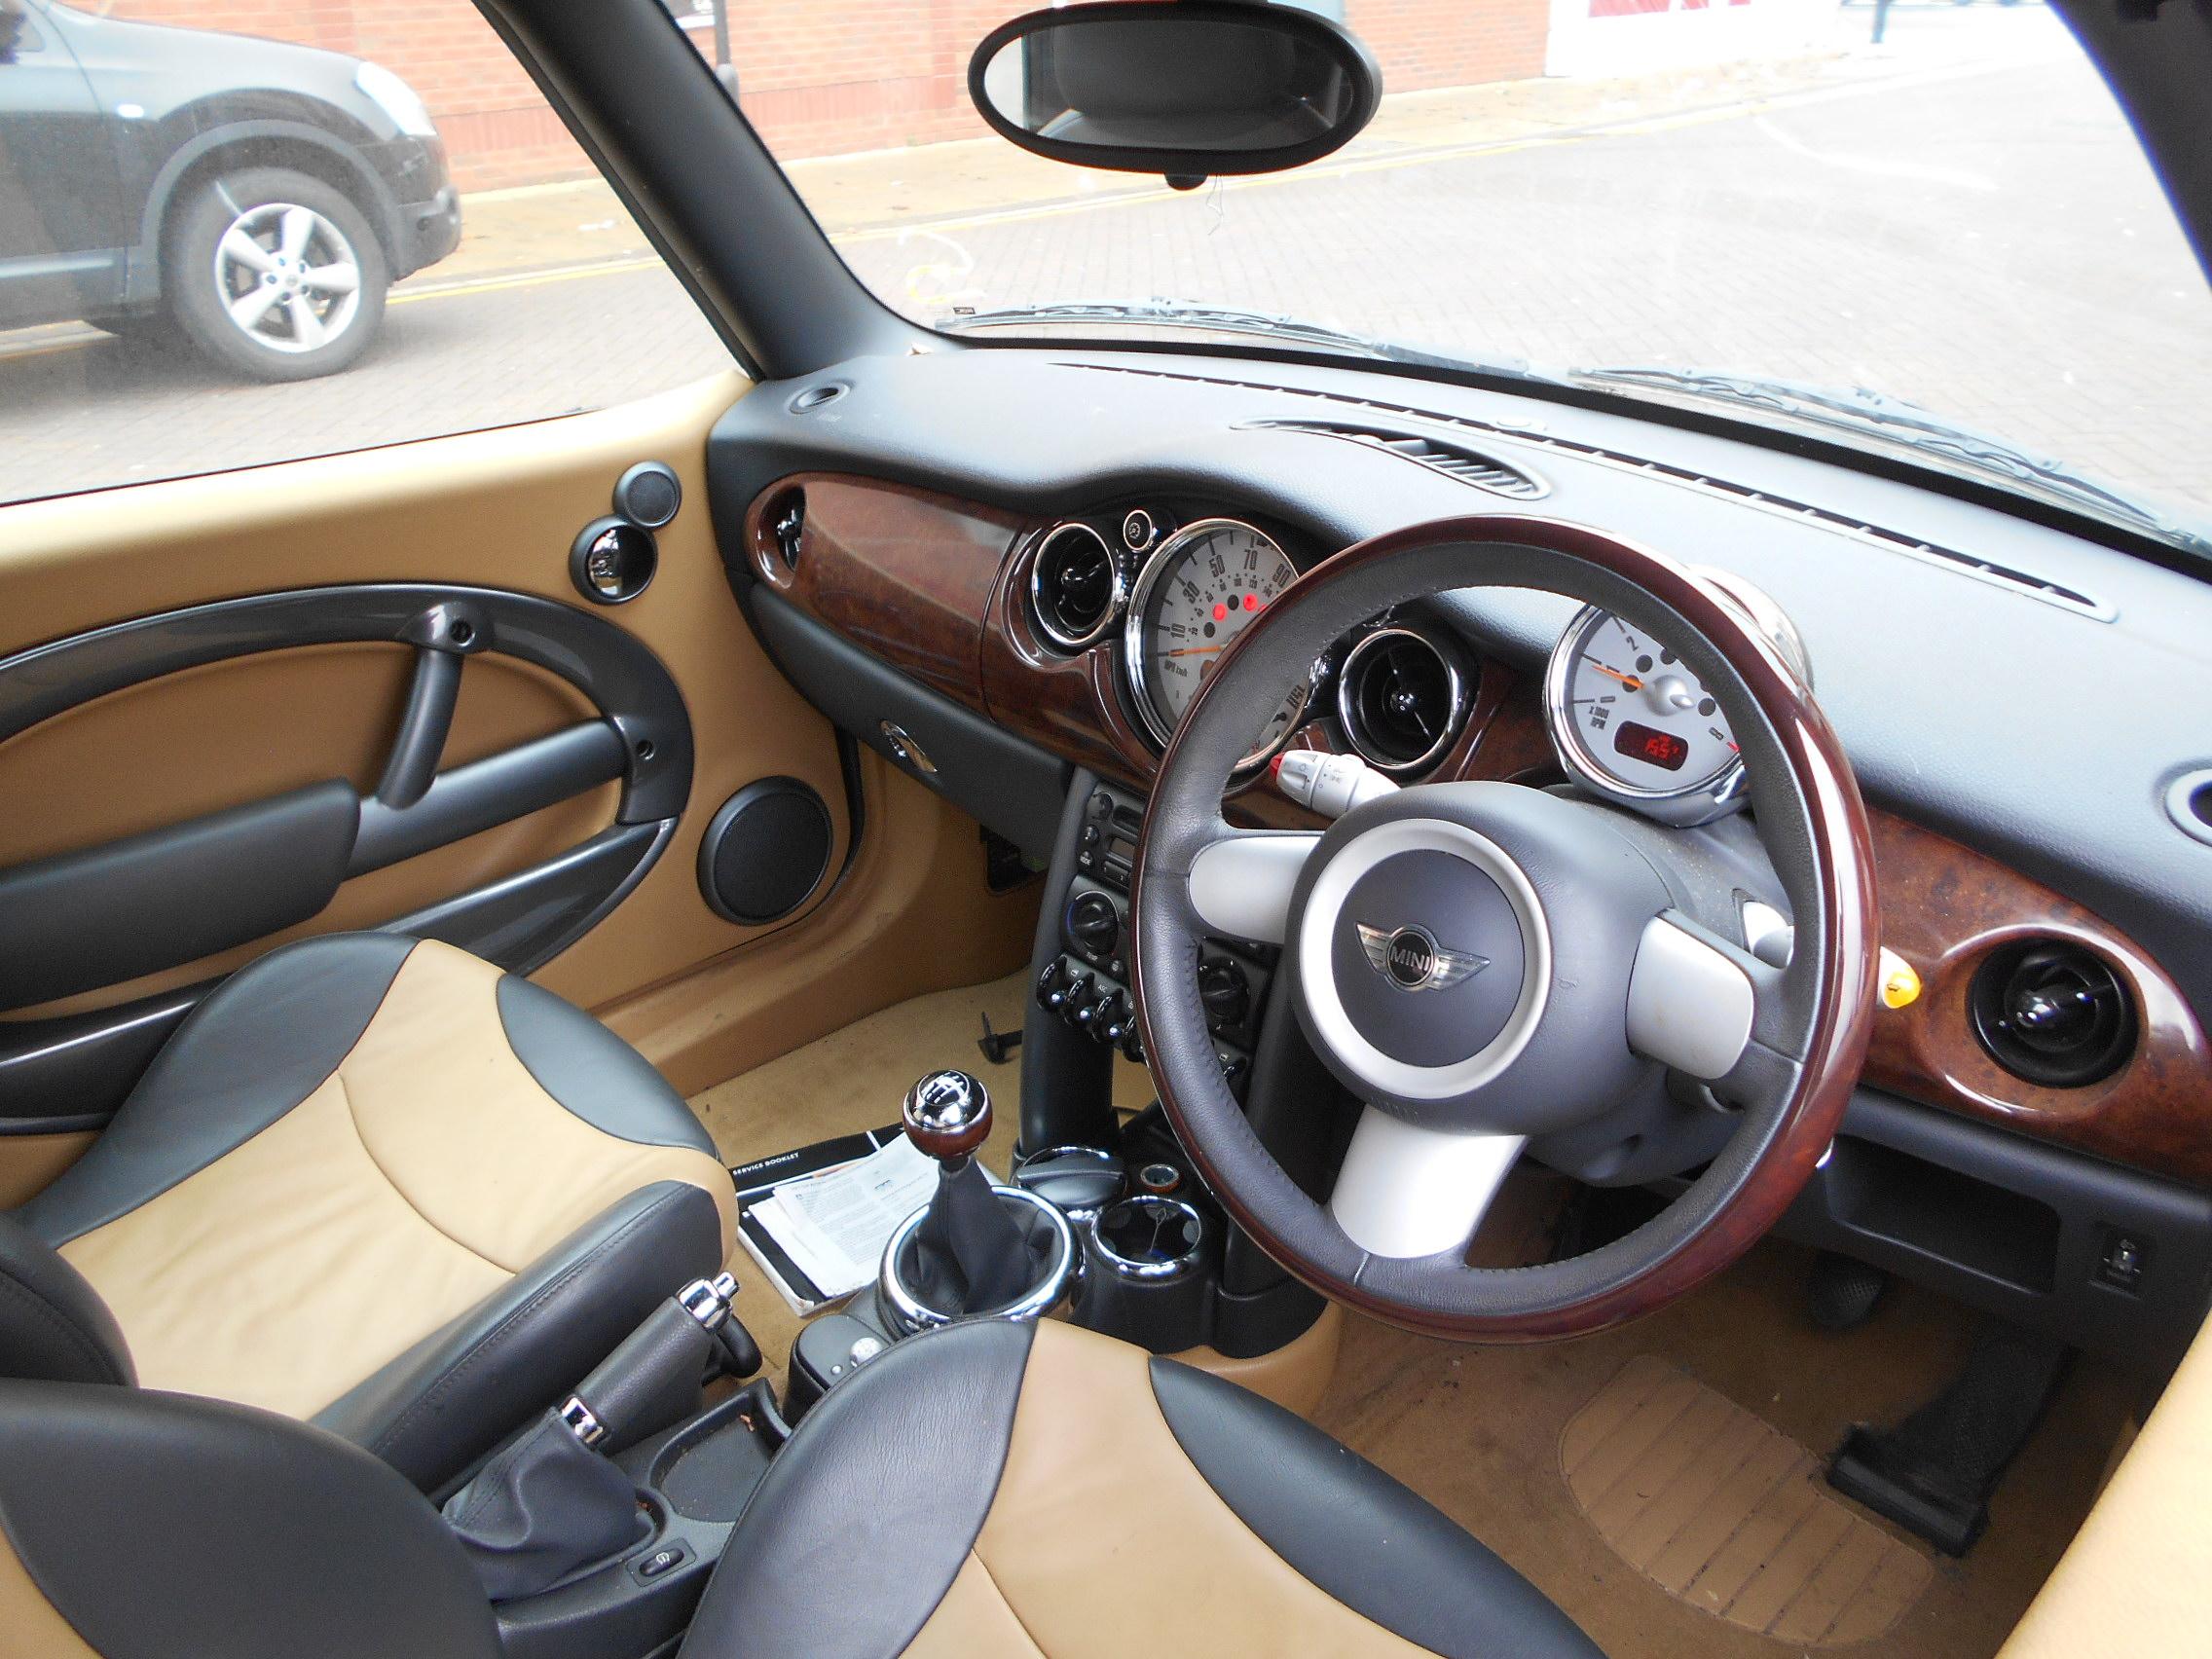 05 British Racing Green Convertible 1.6 BMW Mini Cooper - 7